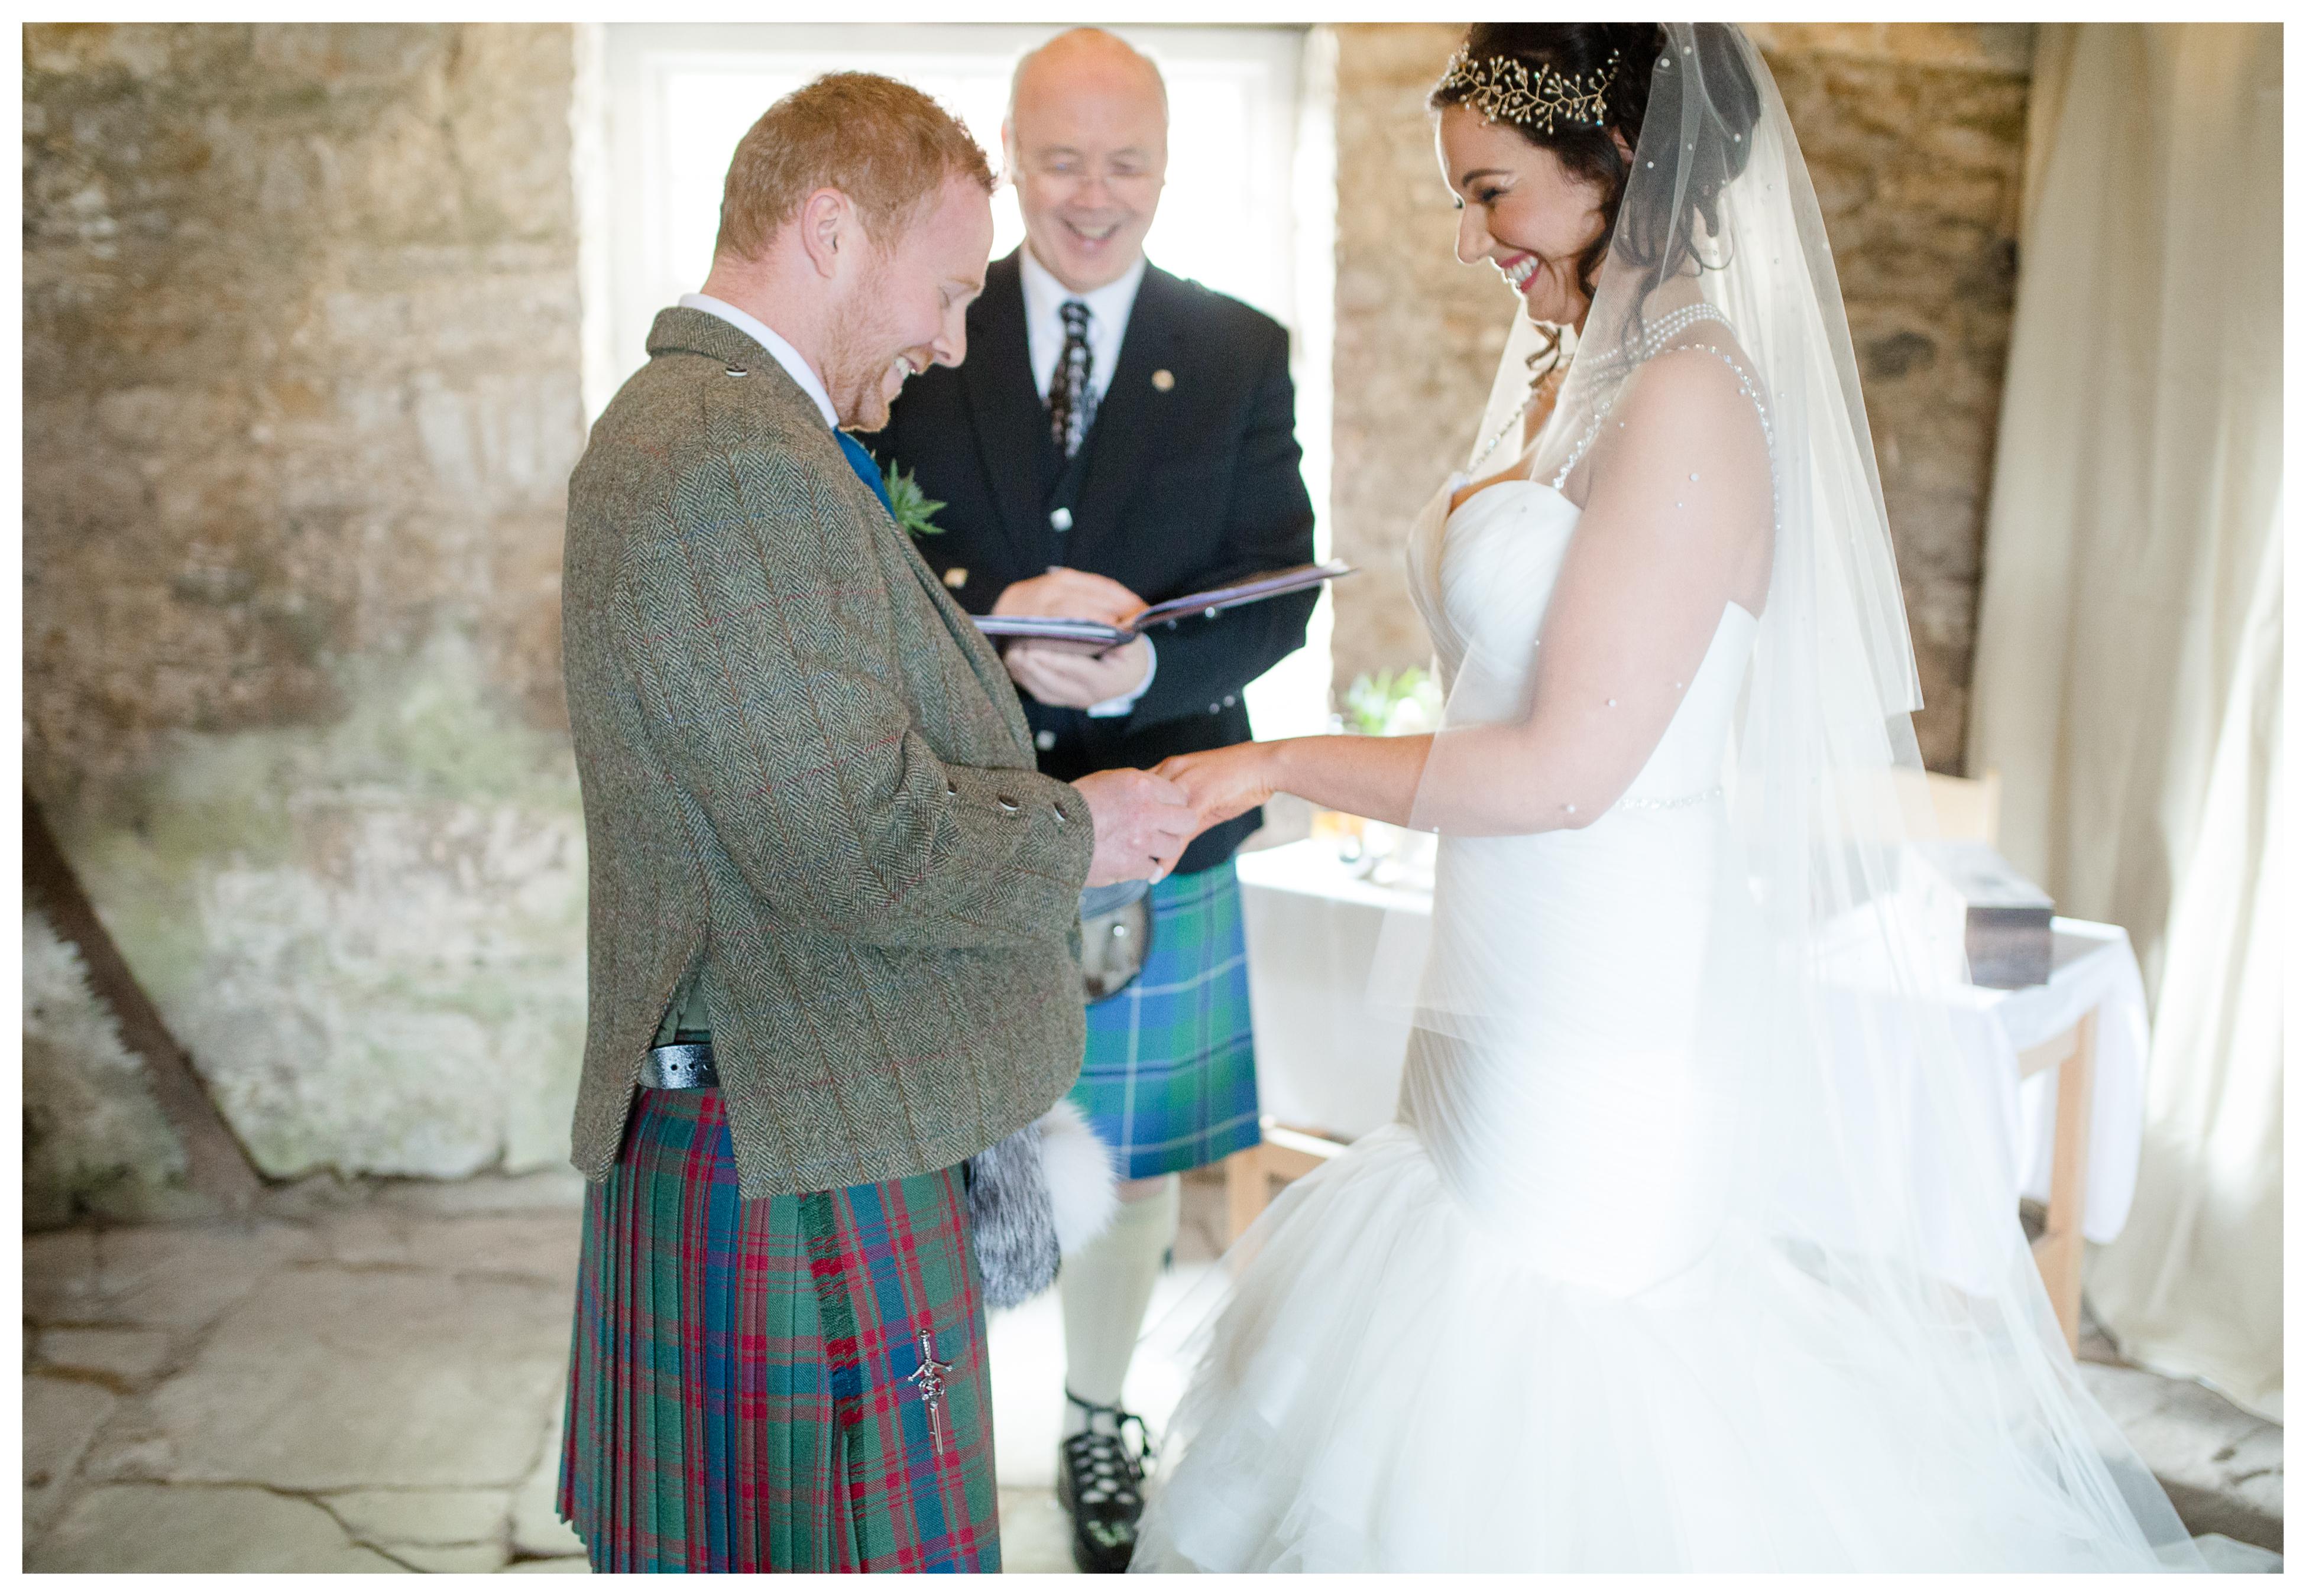 Rachel + Ricky (Elgin, Scotland Wedding) - Simply Green Photography